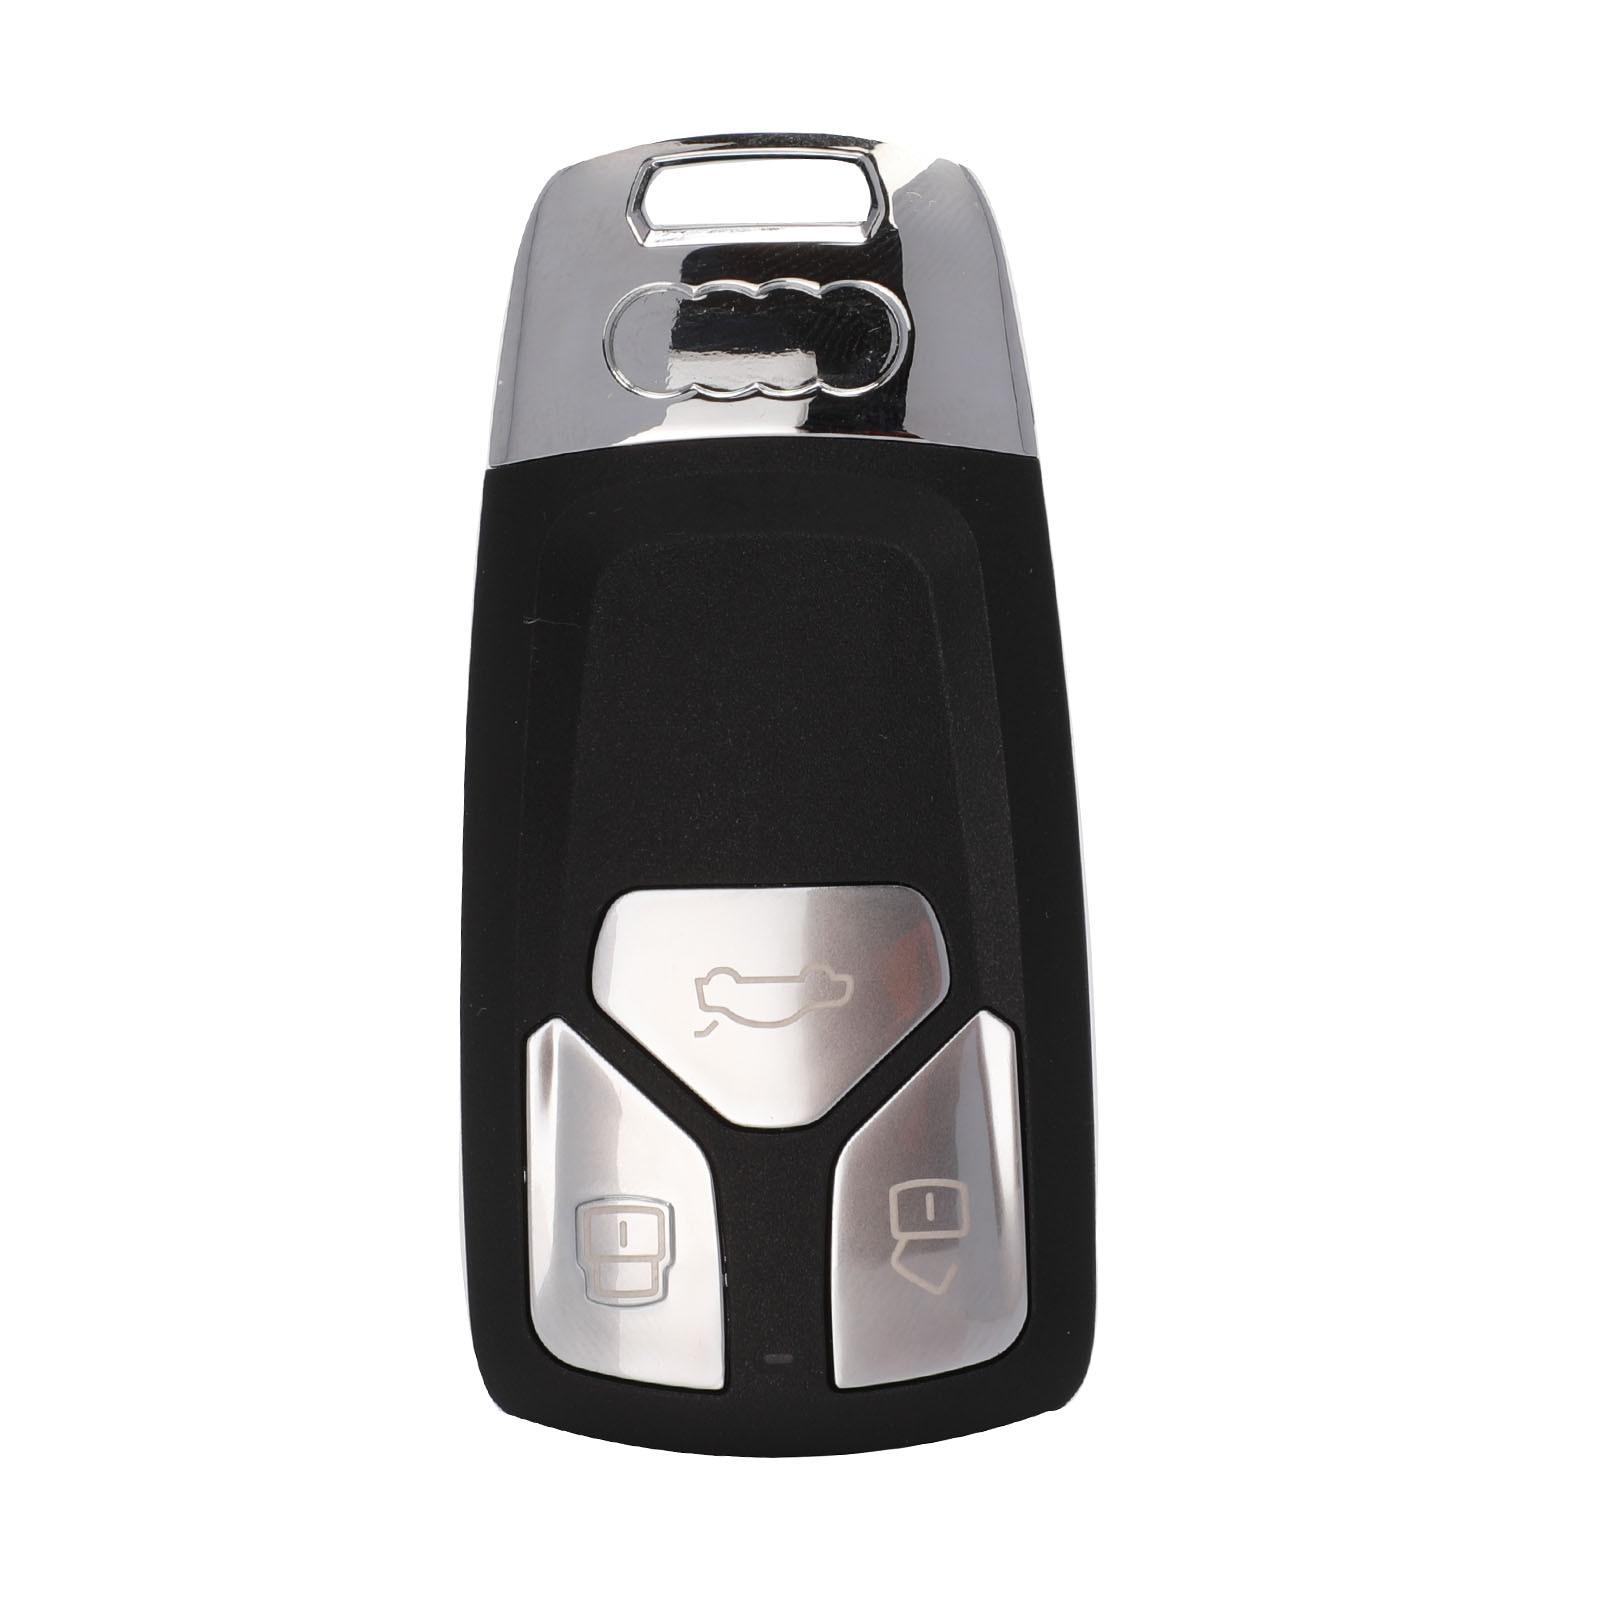 Jingyuqin Upgrade Remote Car Key Shell For Audi A3 A4 A4L A5 A6 A8 Quattro Q5 Q7 S5 SQ7 2017 UP TT 2016 3 Buttons Smart Key FOB